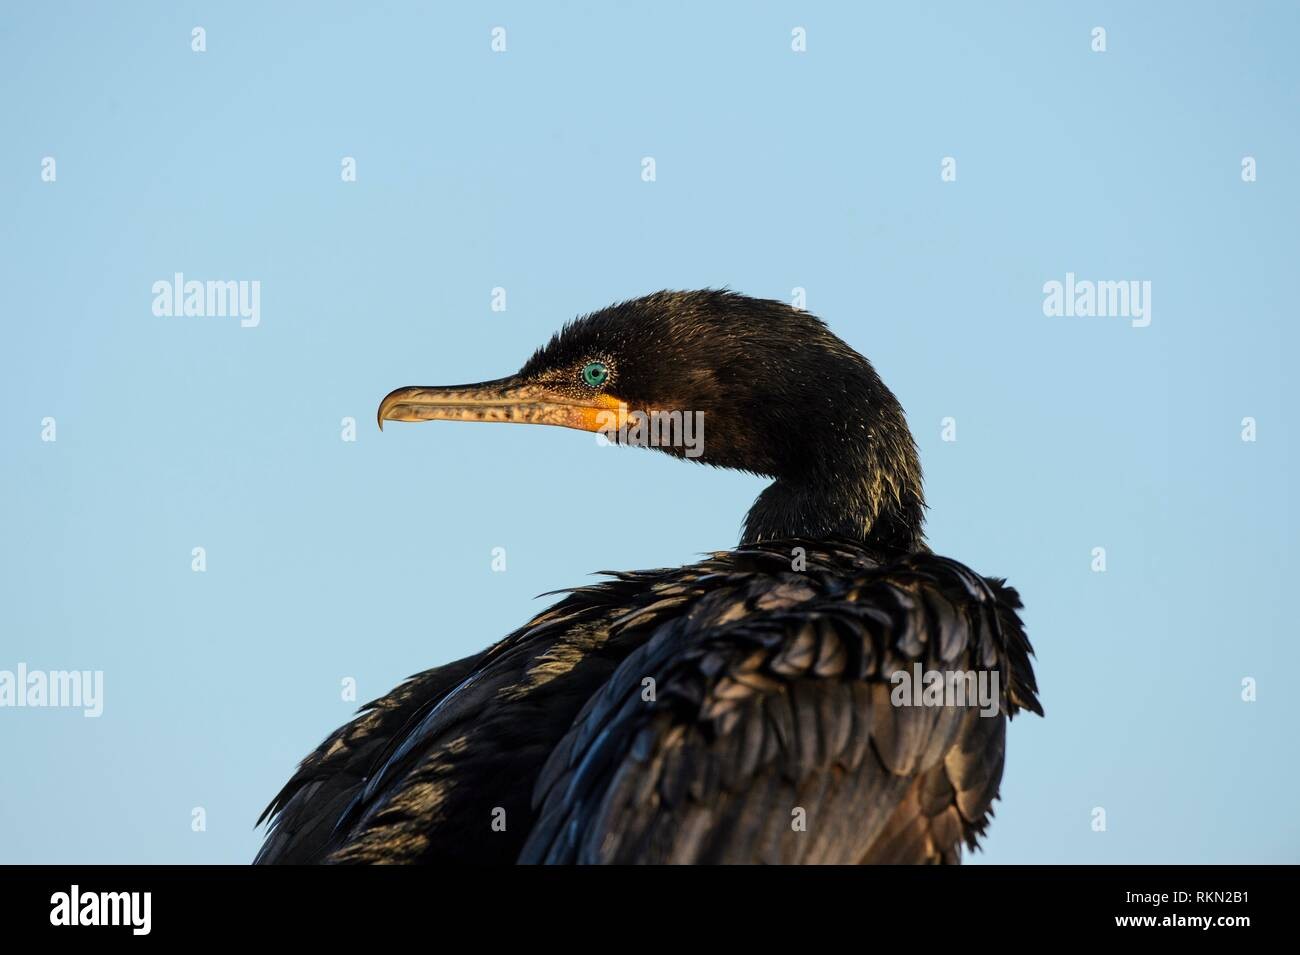 Neotropic/olivaceous cormorant (Phalacrocorax brasilianus), Anahuac NWR, Texas, USA. - Stock Image